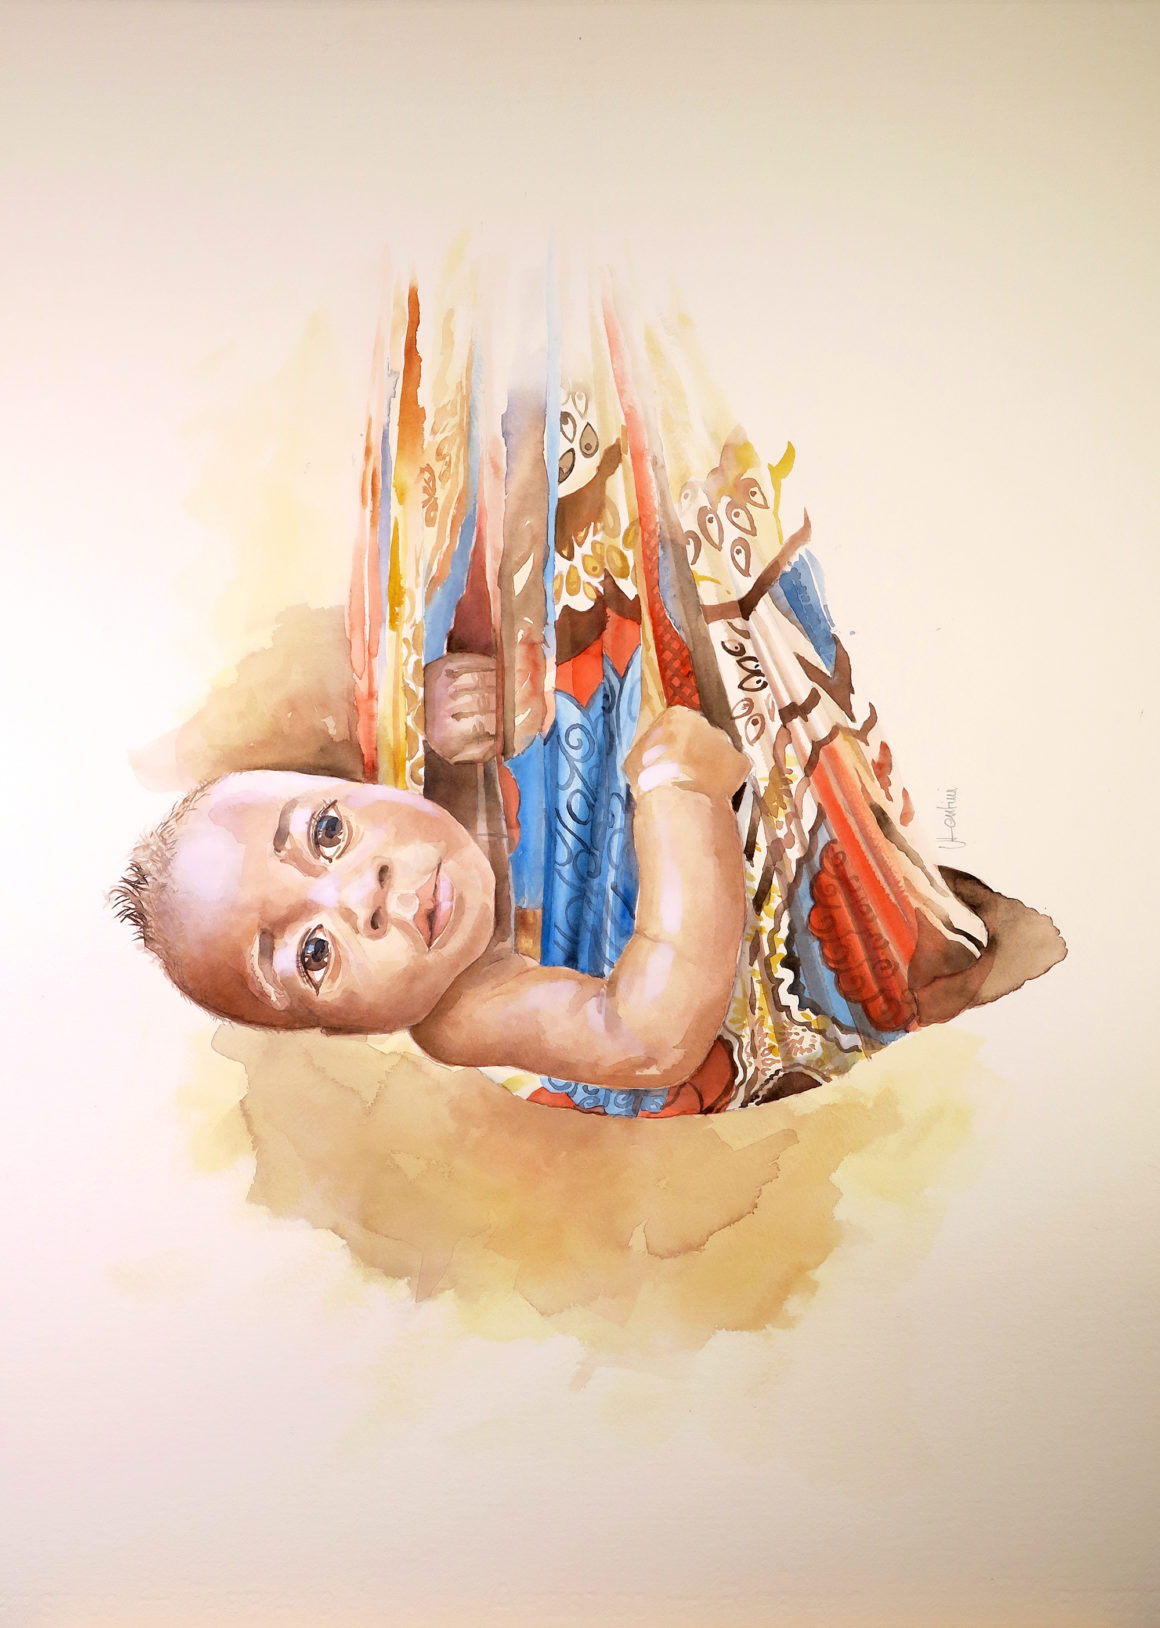 002 Vito Lentini Designer Acquarelli For_Aleimar_Baby in the scarf_Wat_56x76